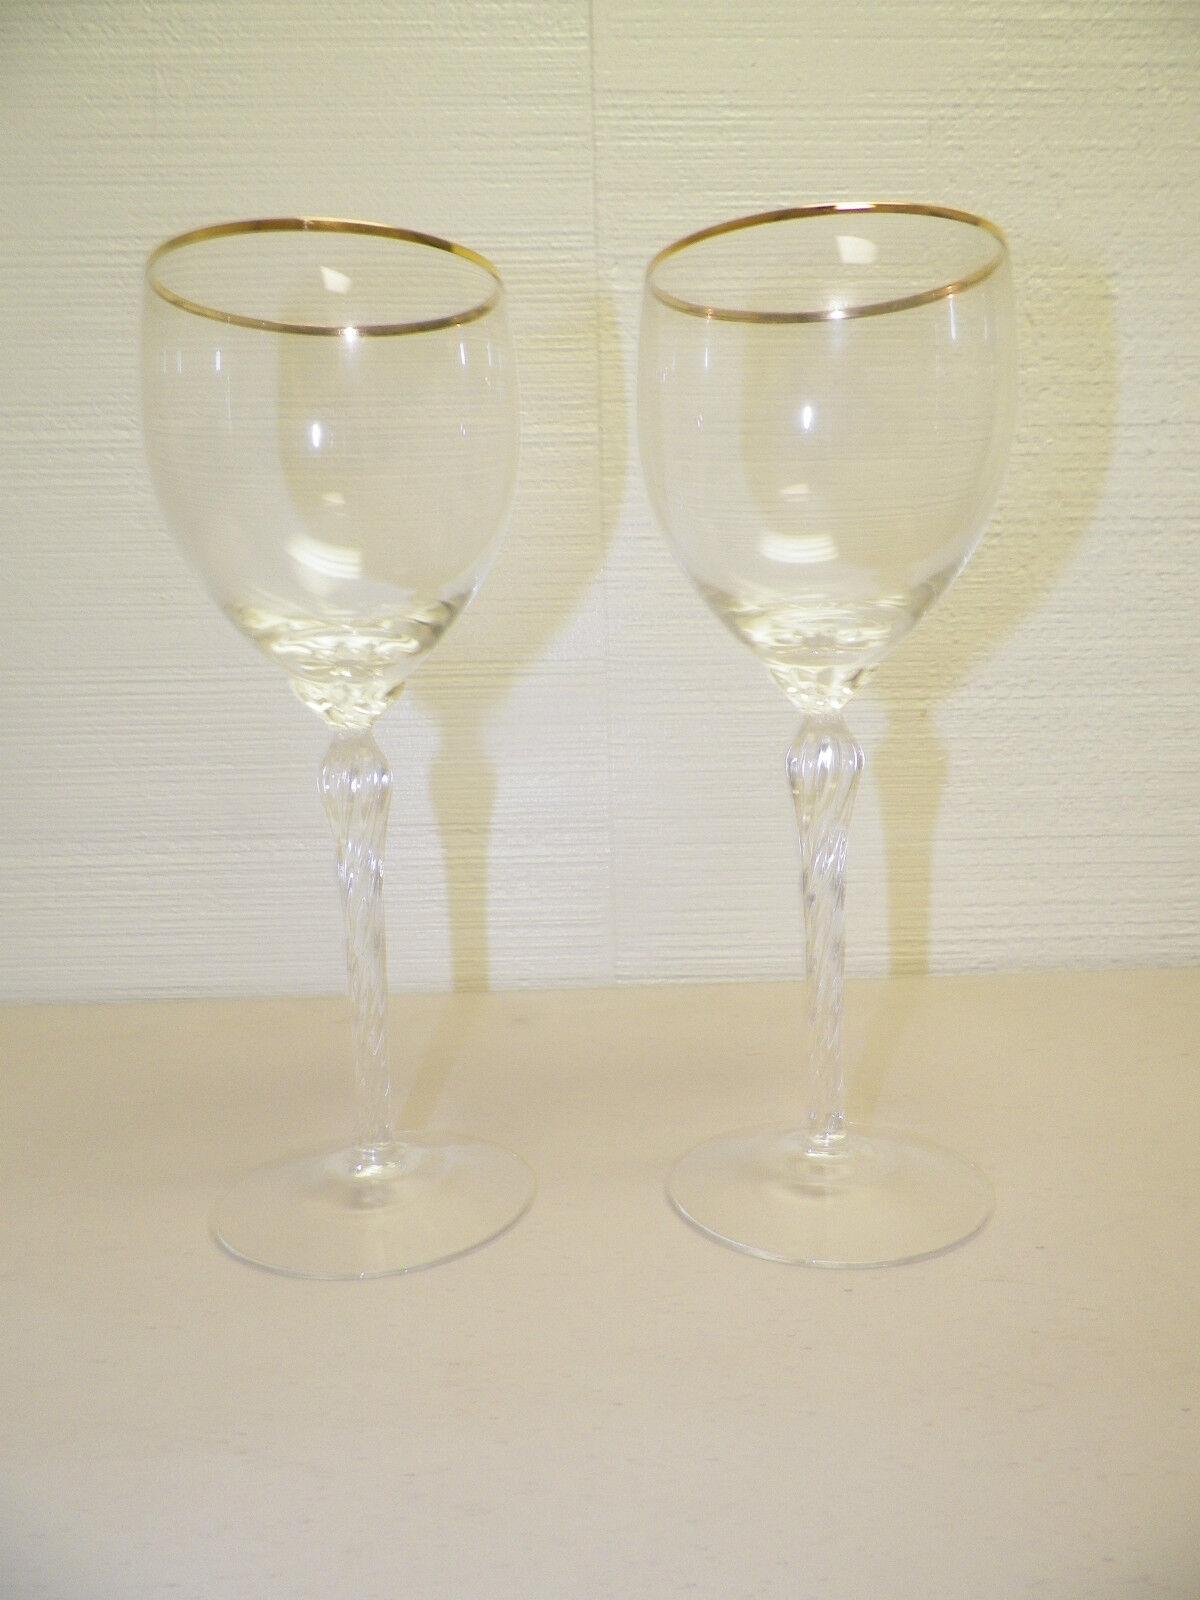 Lenox Crystal Stemware Gold Rim Wine Glasses 8 1 2 Tall Pair Two 2 Used Cad